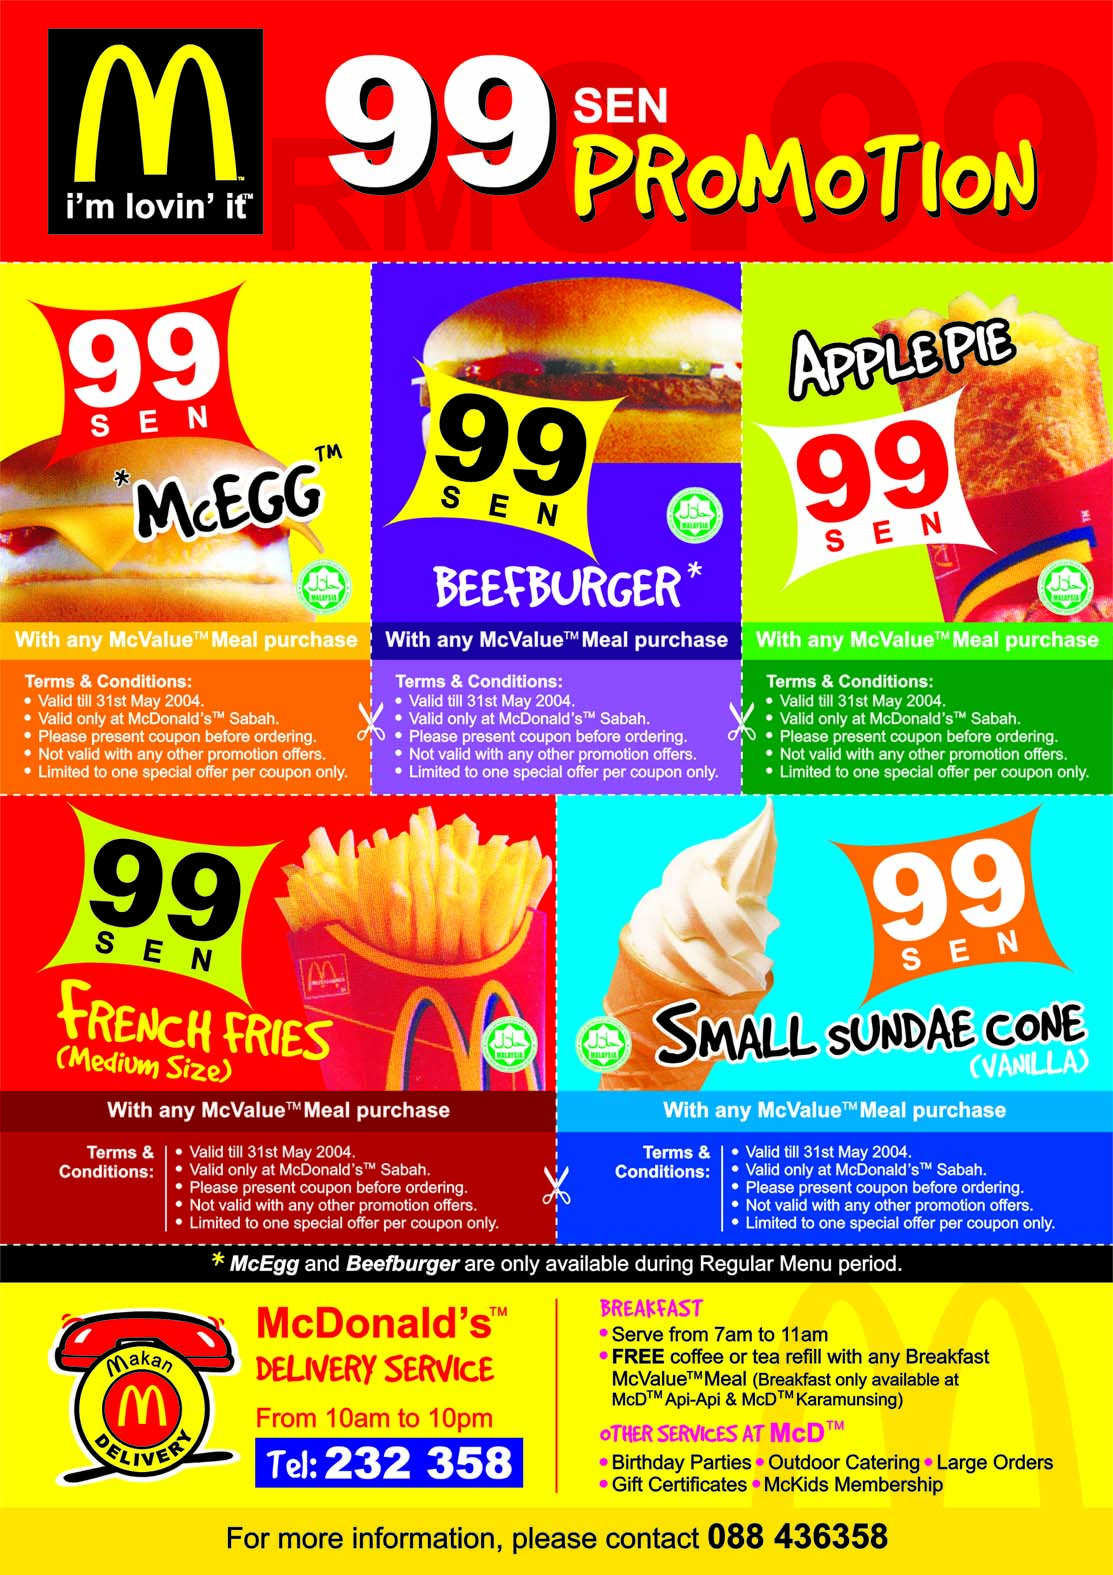 10 Food Brochure Design Samples for Inspiration JayceoYesta